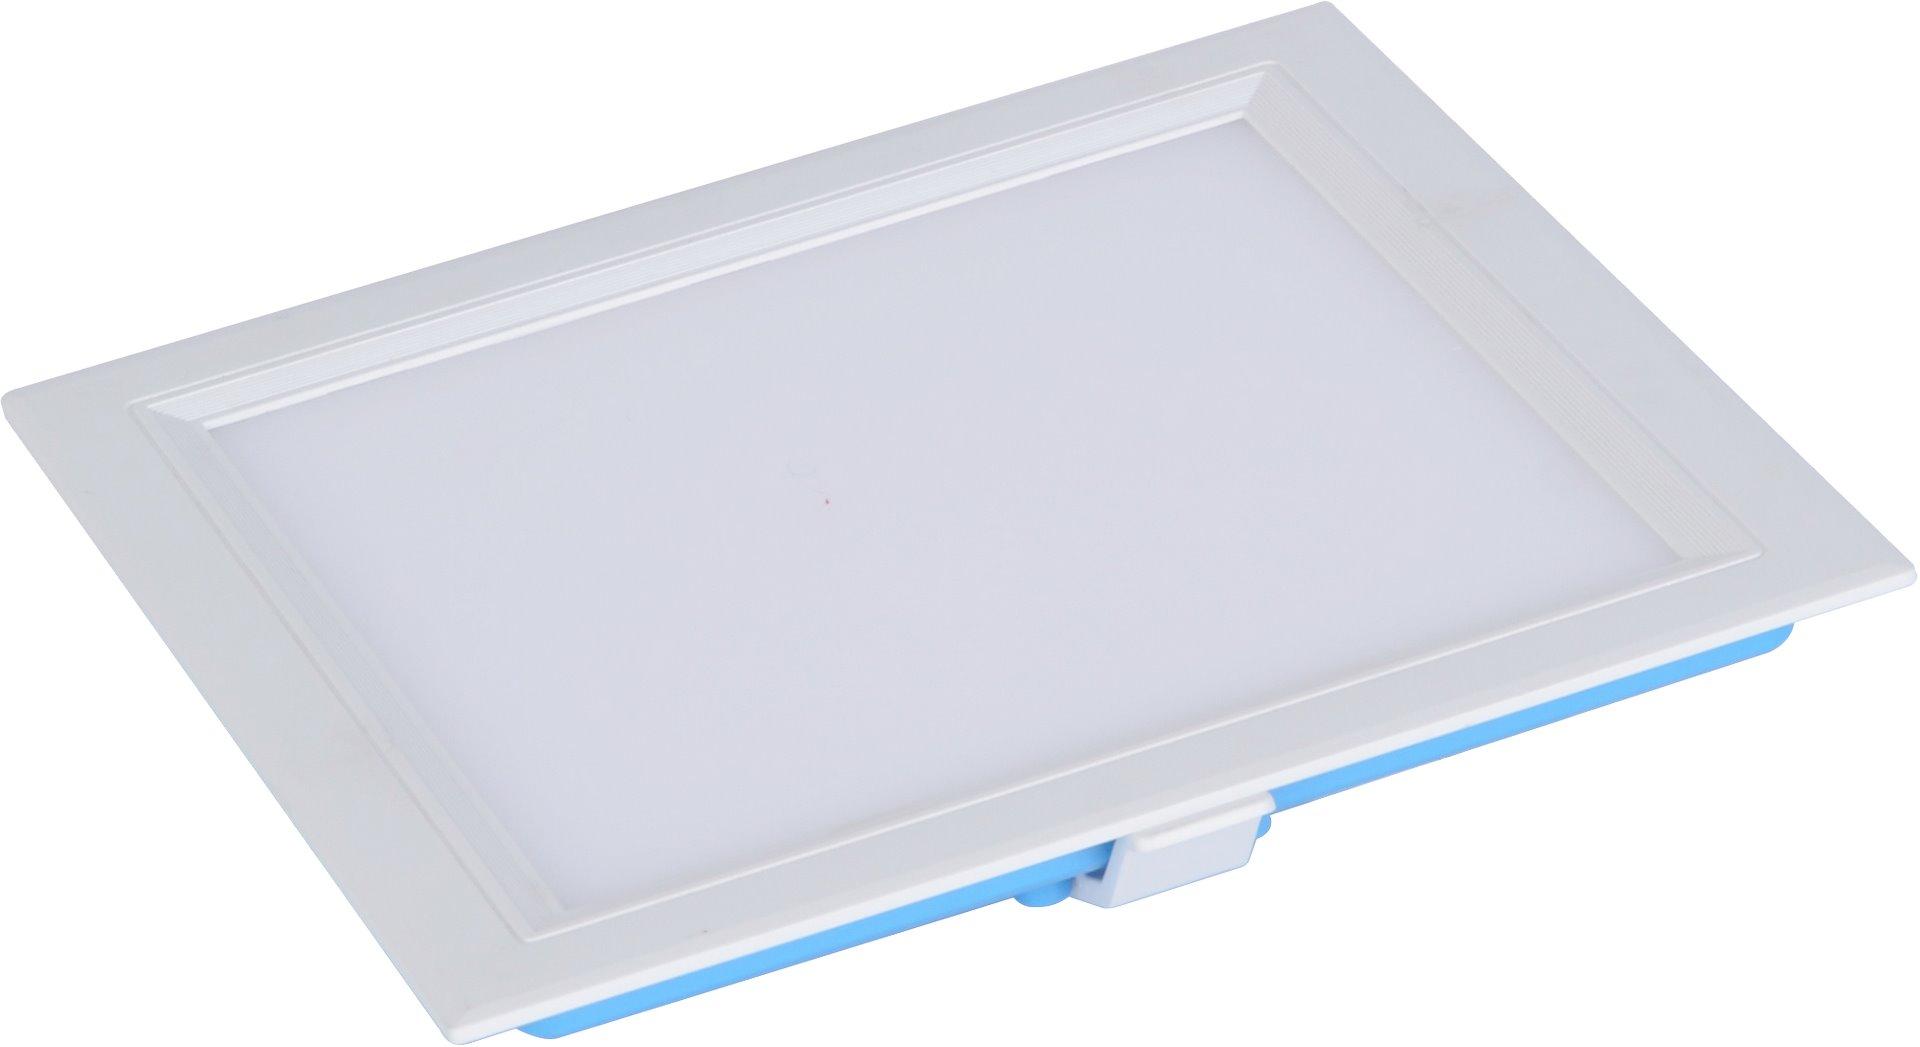 LED svítidla DAISY VEGA-S White 18W NW (GXDS236)